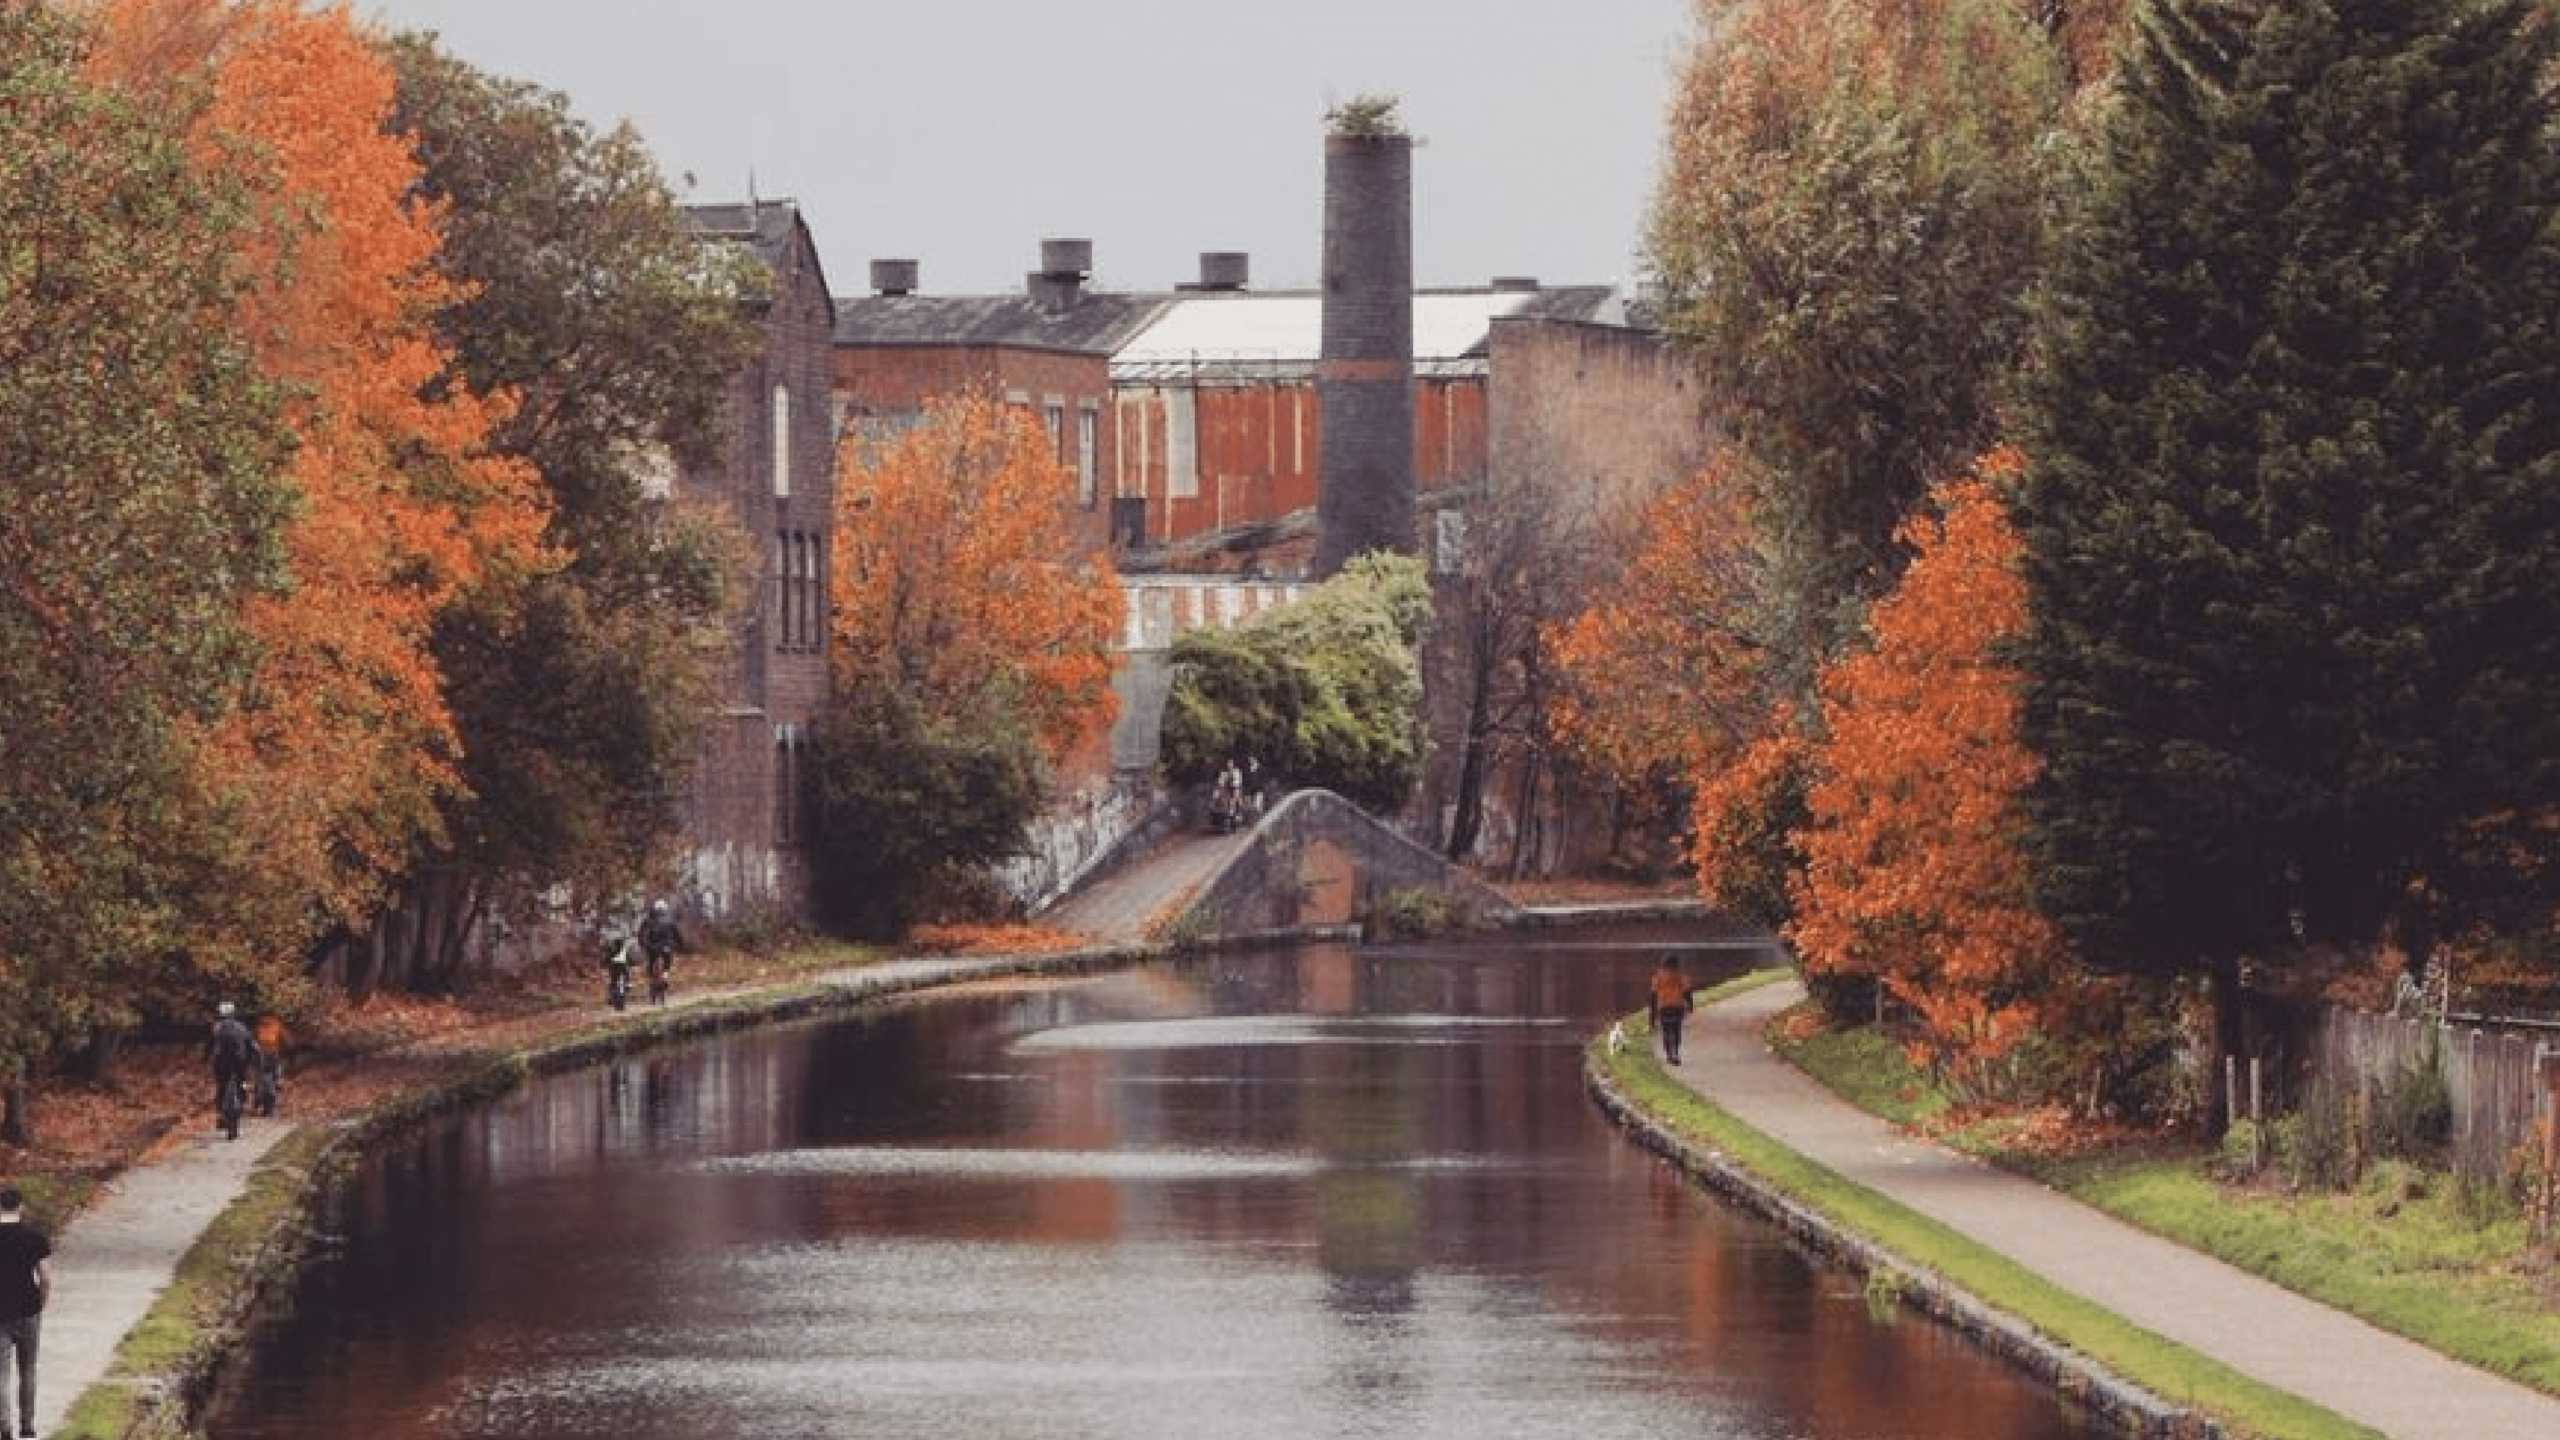 5 Outdoor Areas To Visit in Birmingham